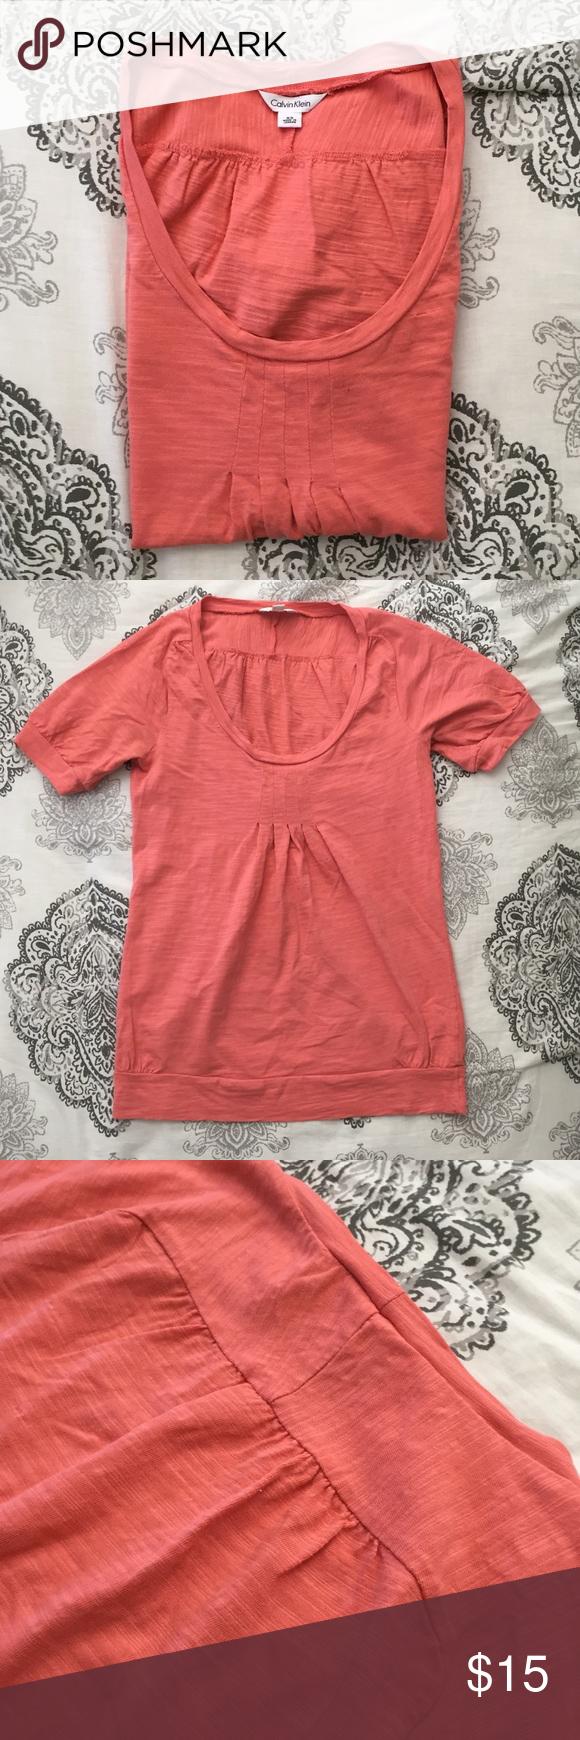 Calvin Klein Short Sleeve Shirt Calvin Klein Shorts Calvin Klein Coral Shirt [ 1740 x 580 Pixel ]